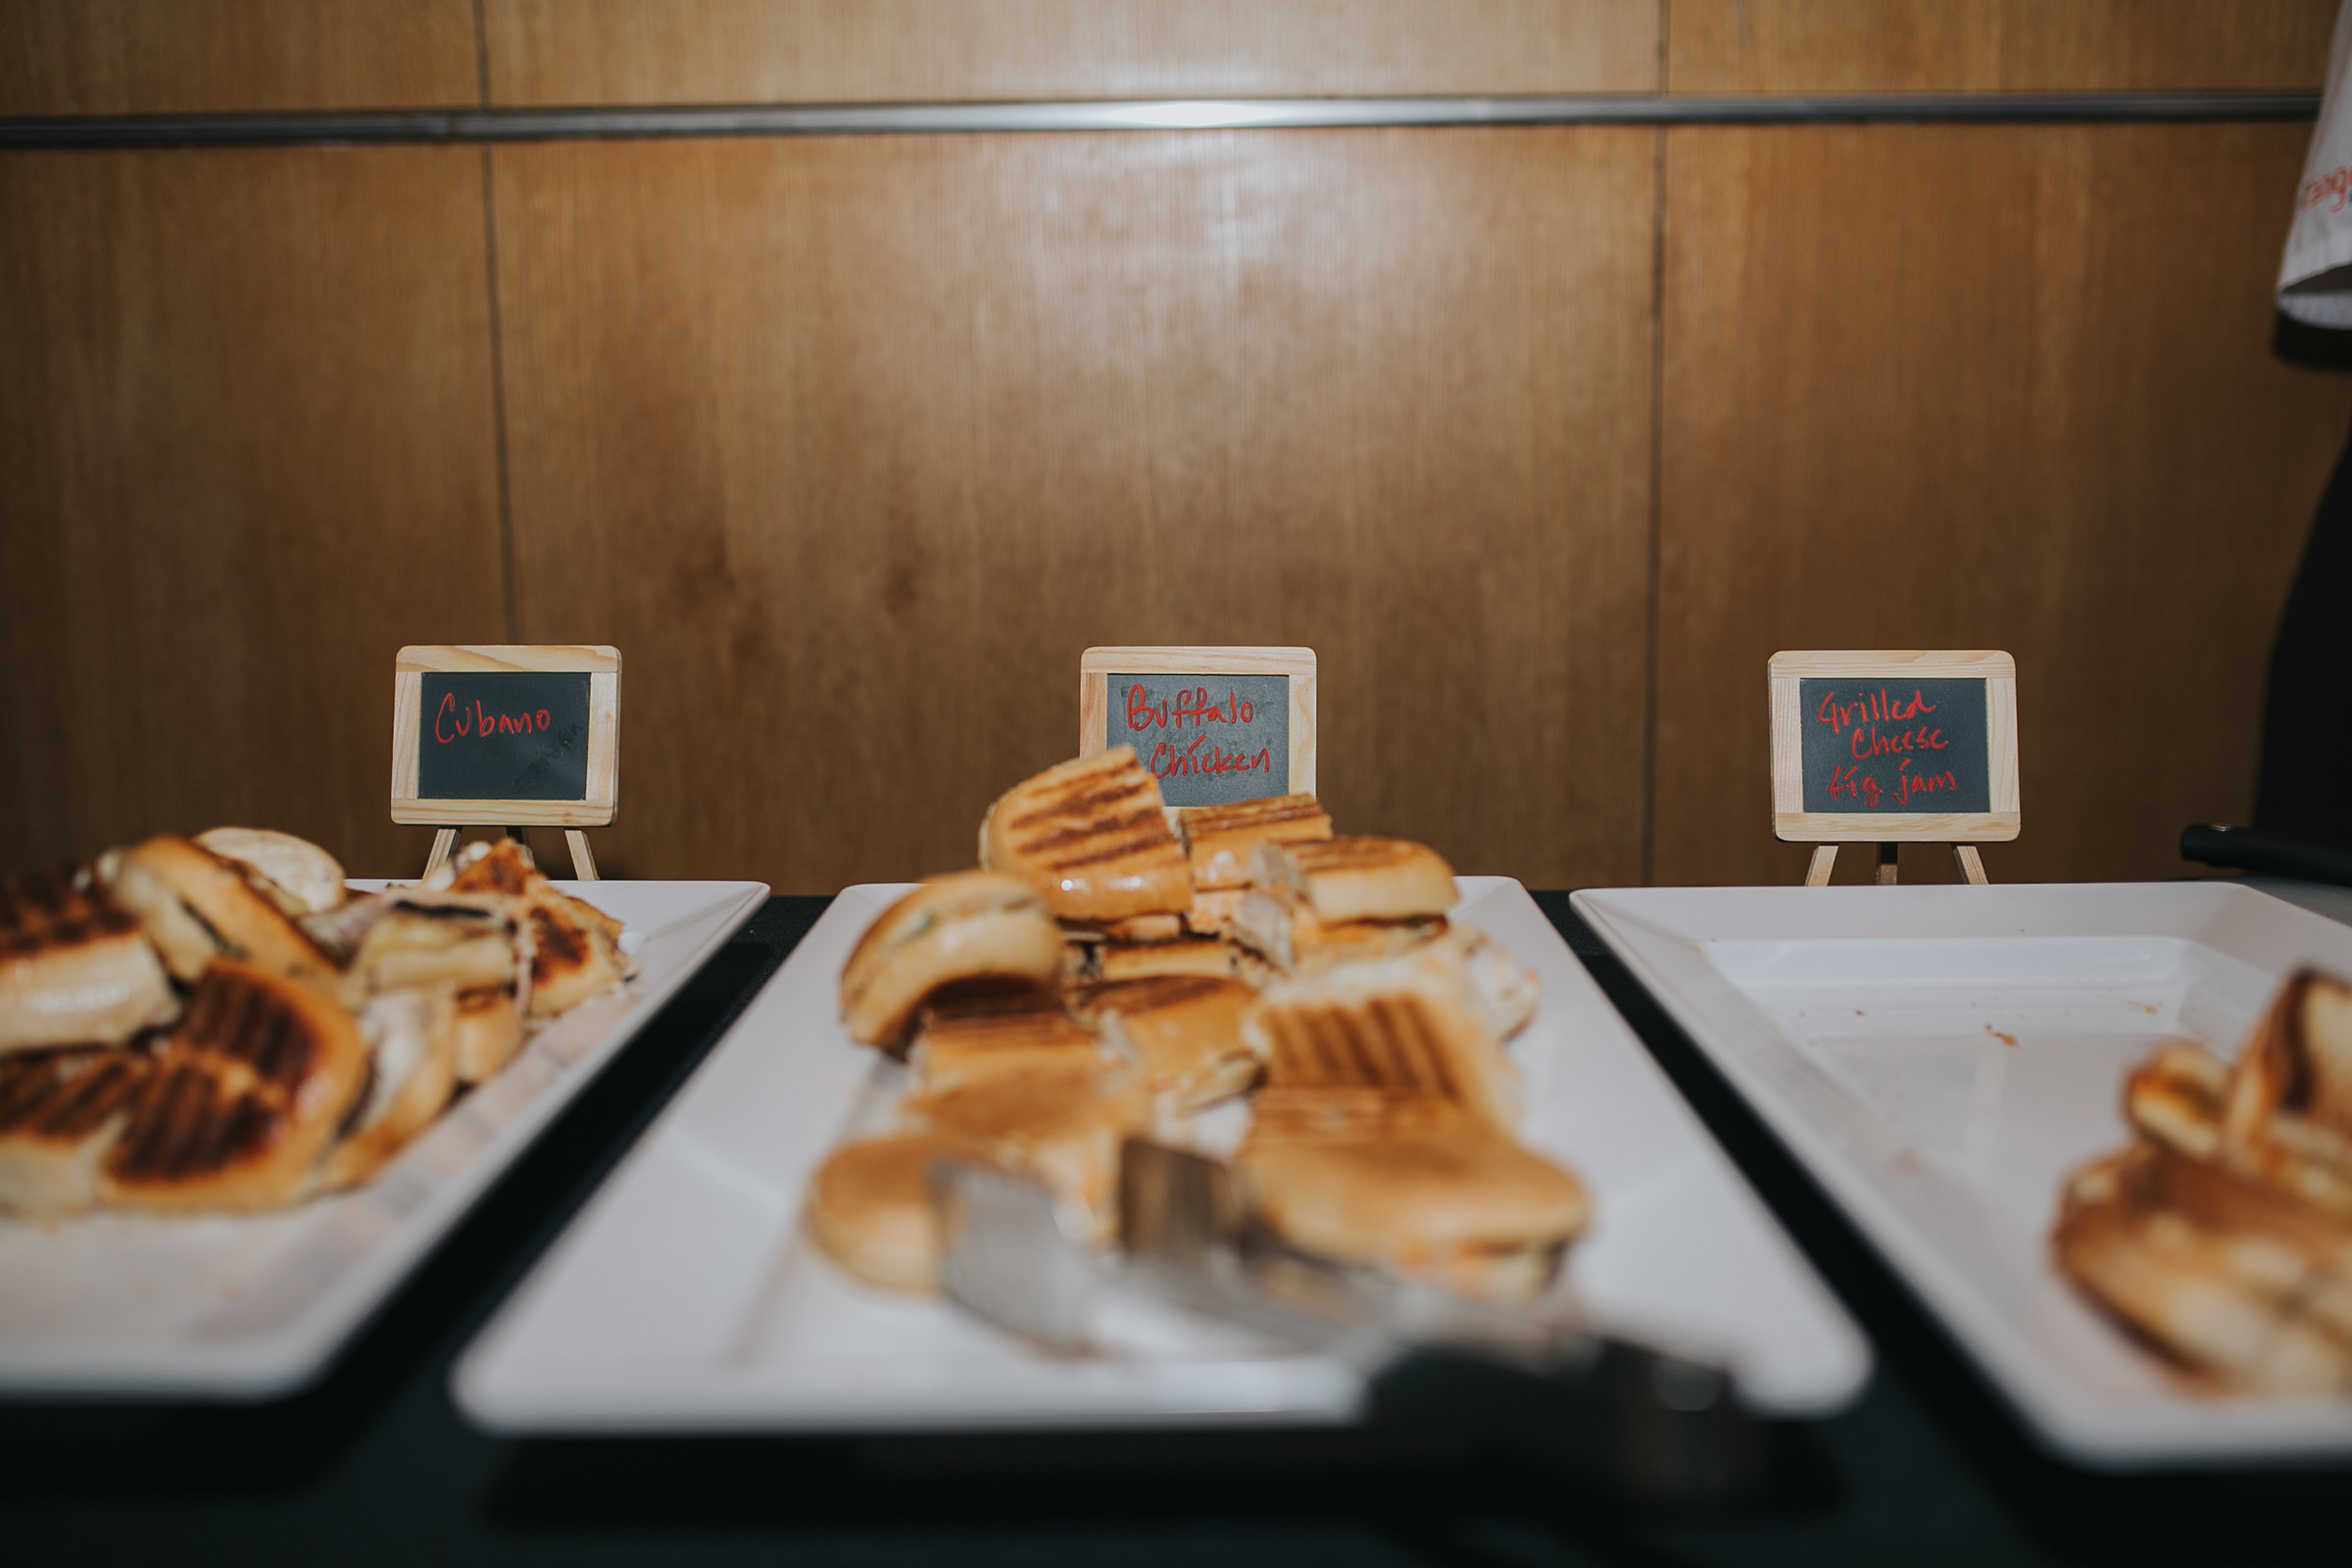 wedding-party-food-sandwhiches-desmoines-iowa-art-center-raelyn-ramey-photography.jpg